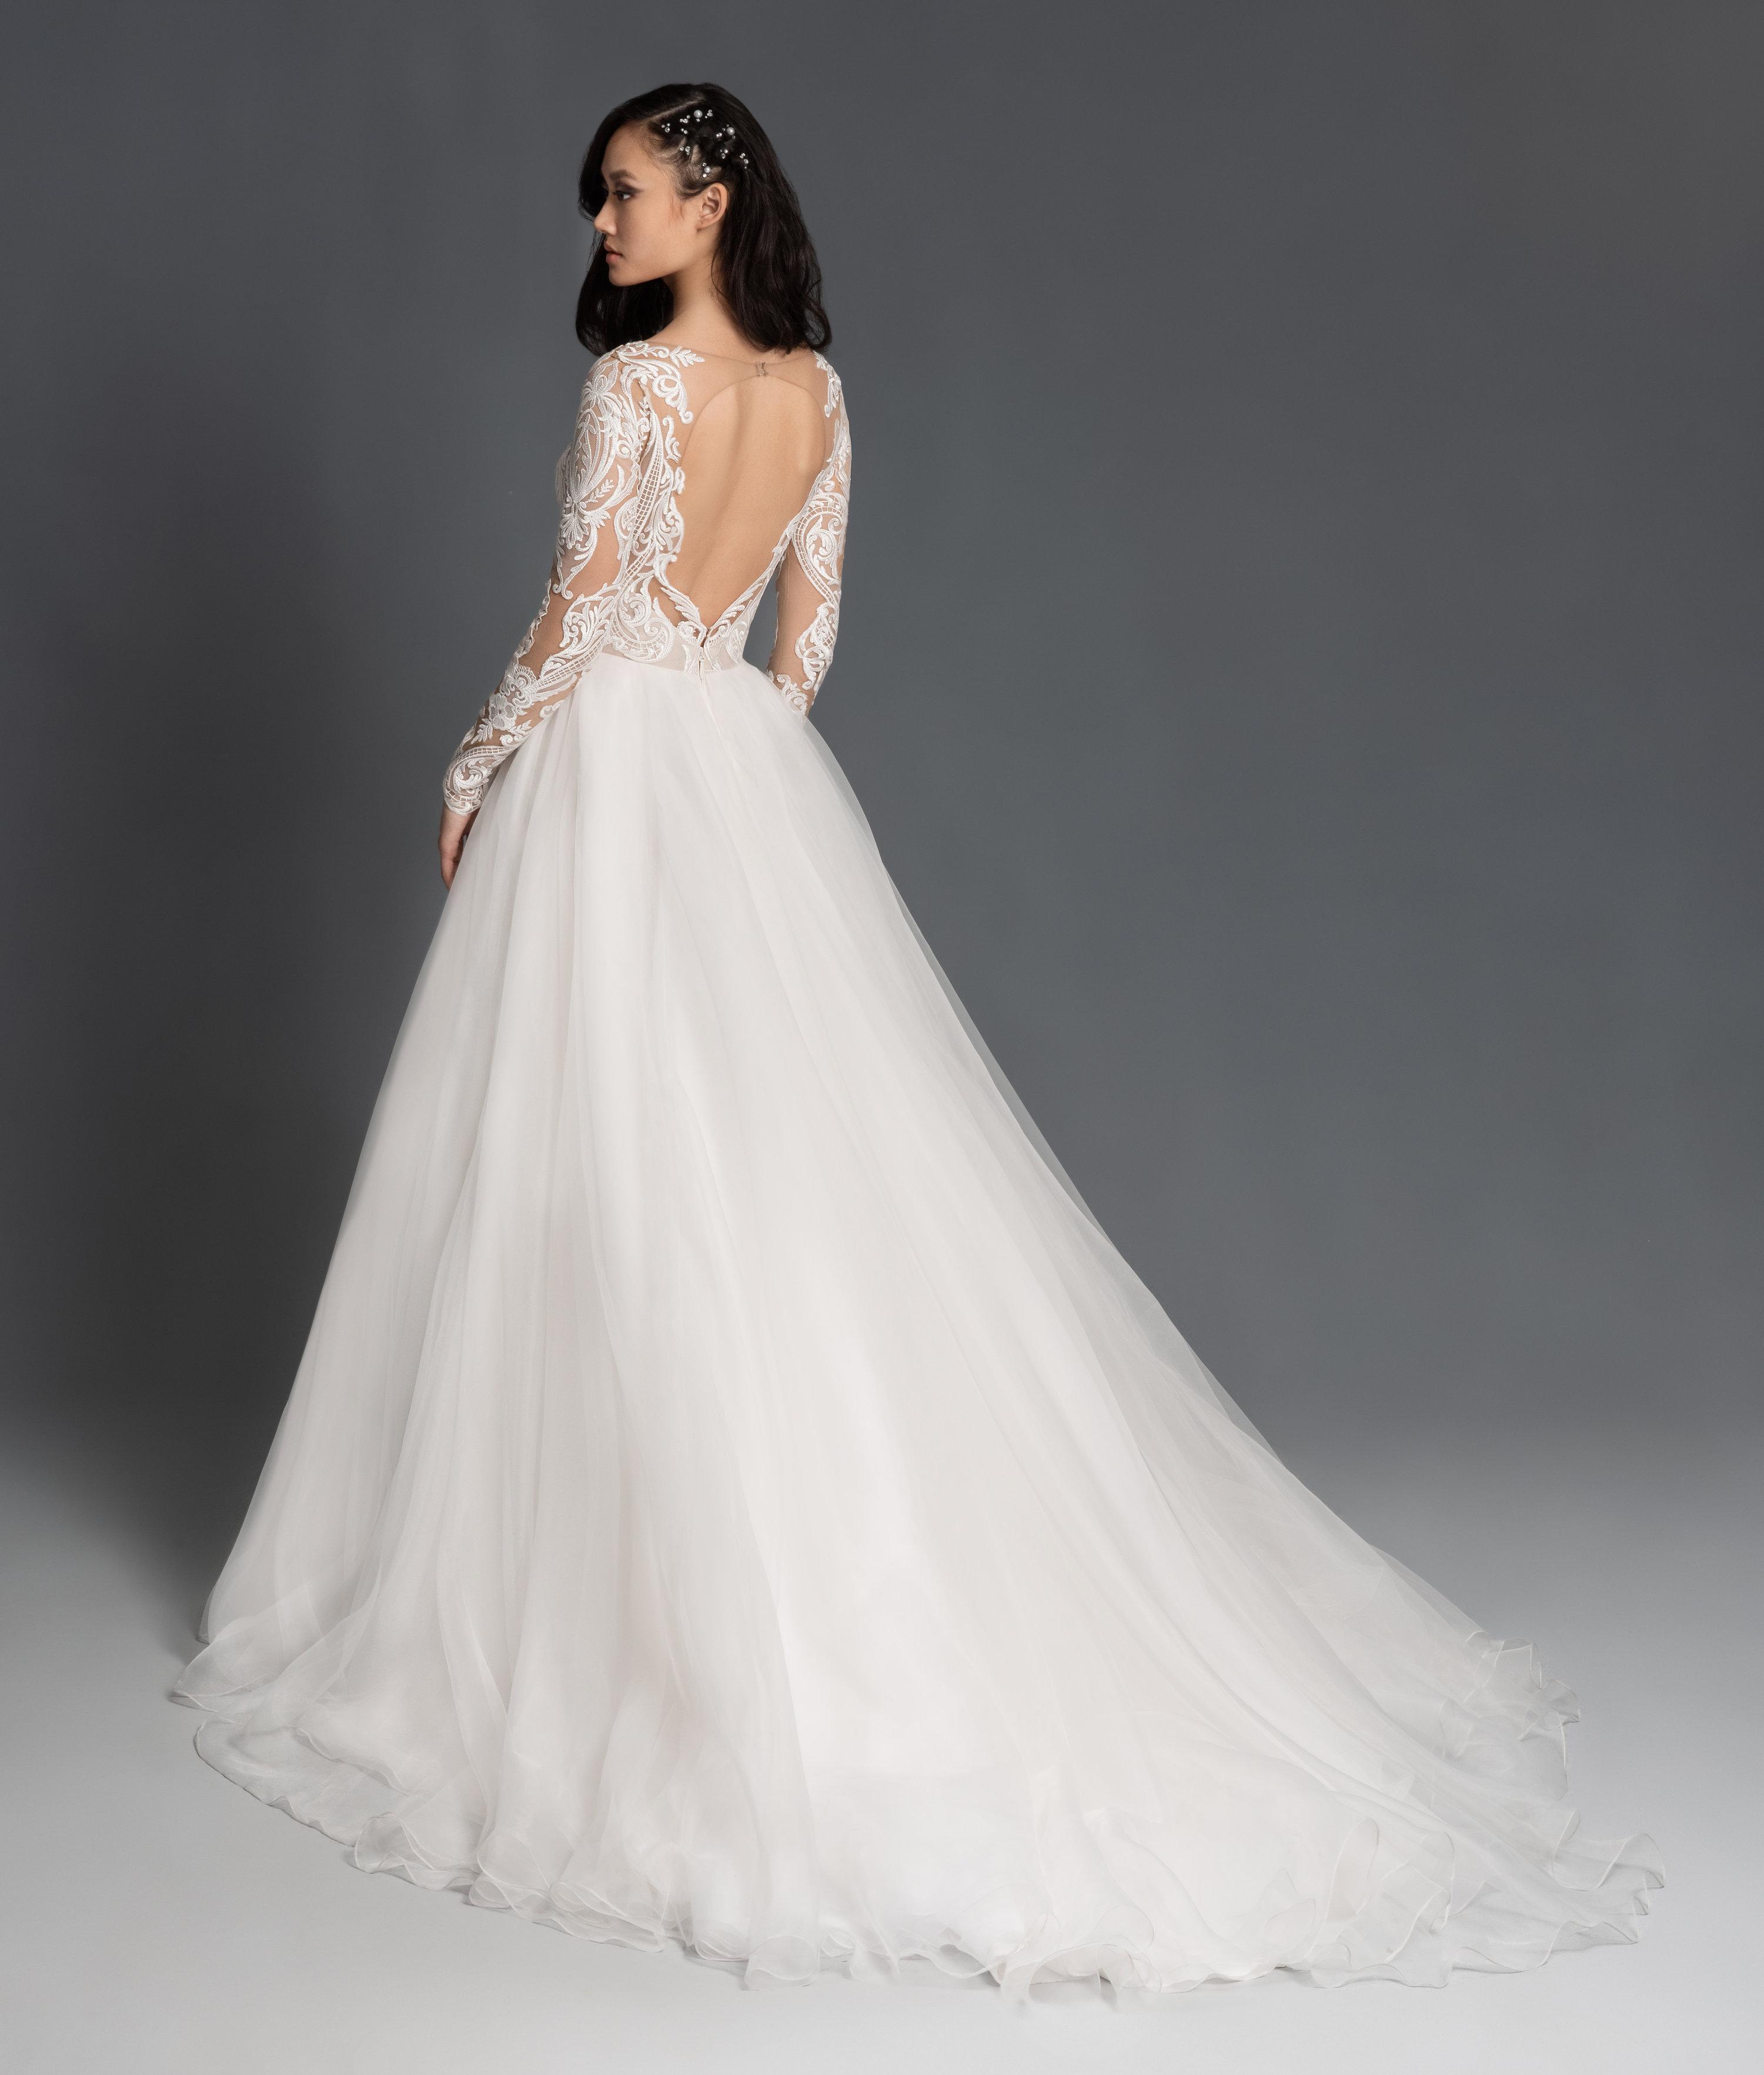 hayley-paige-bridal-fall-2019-style-6959-mulan_1